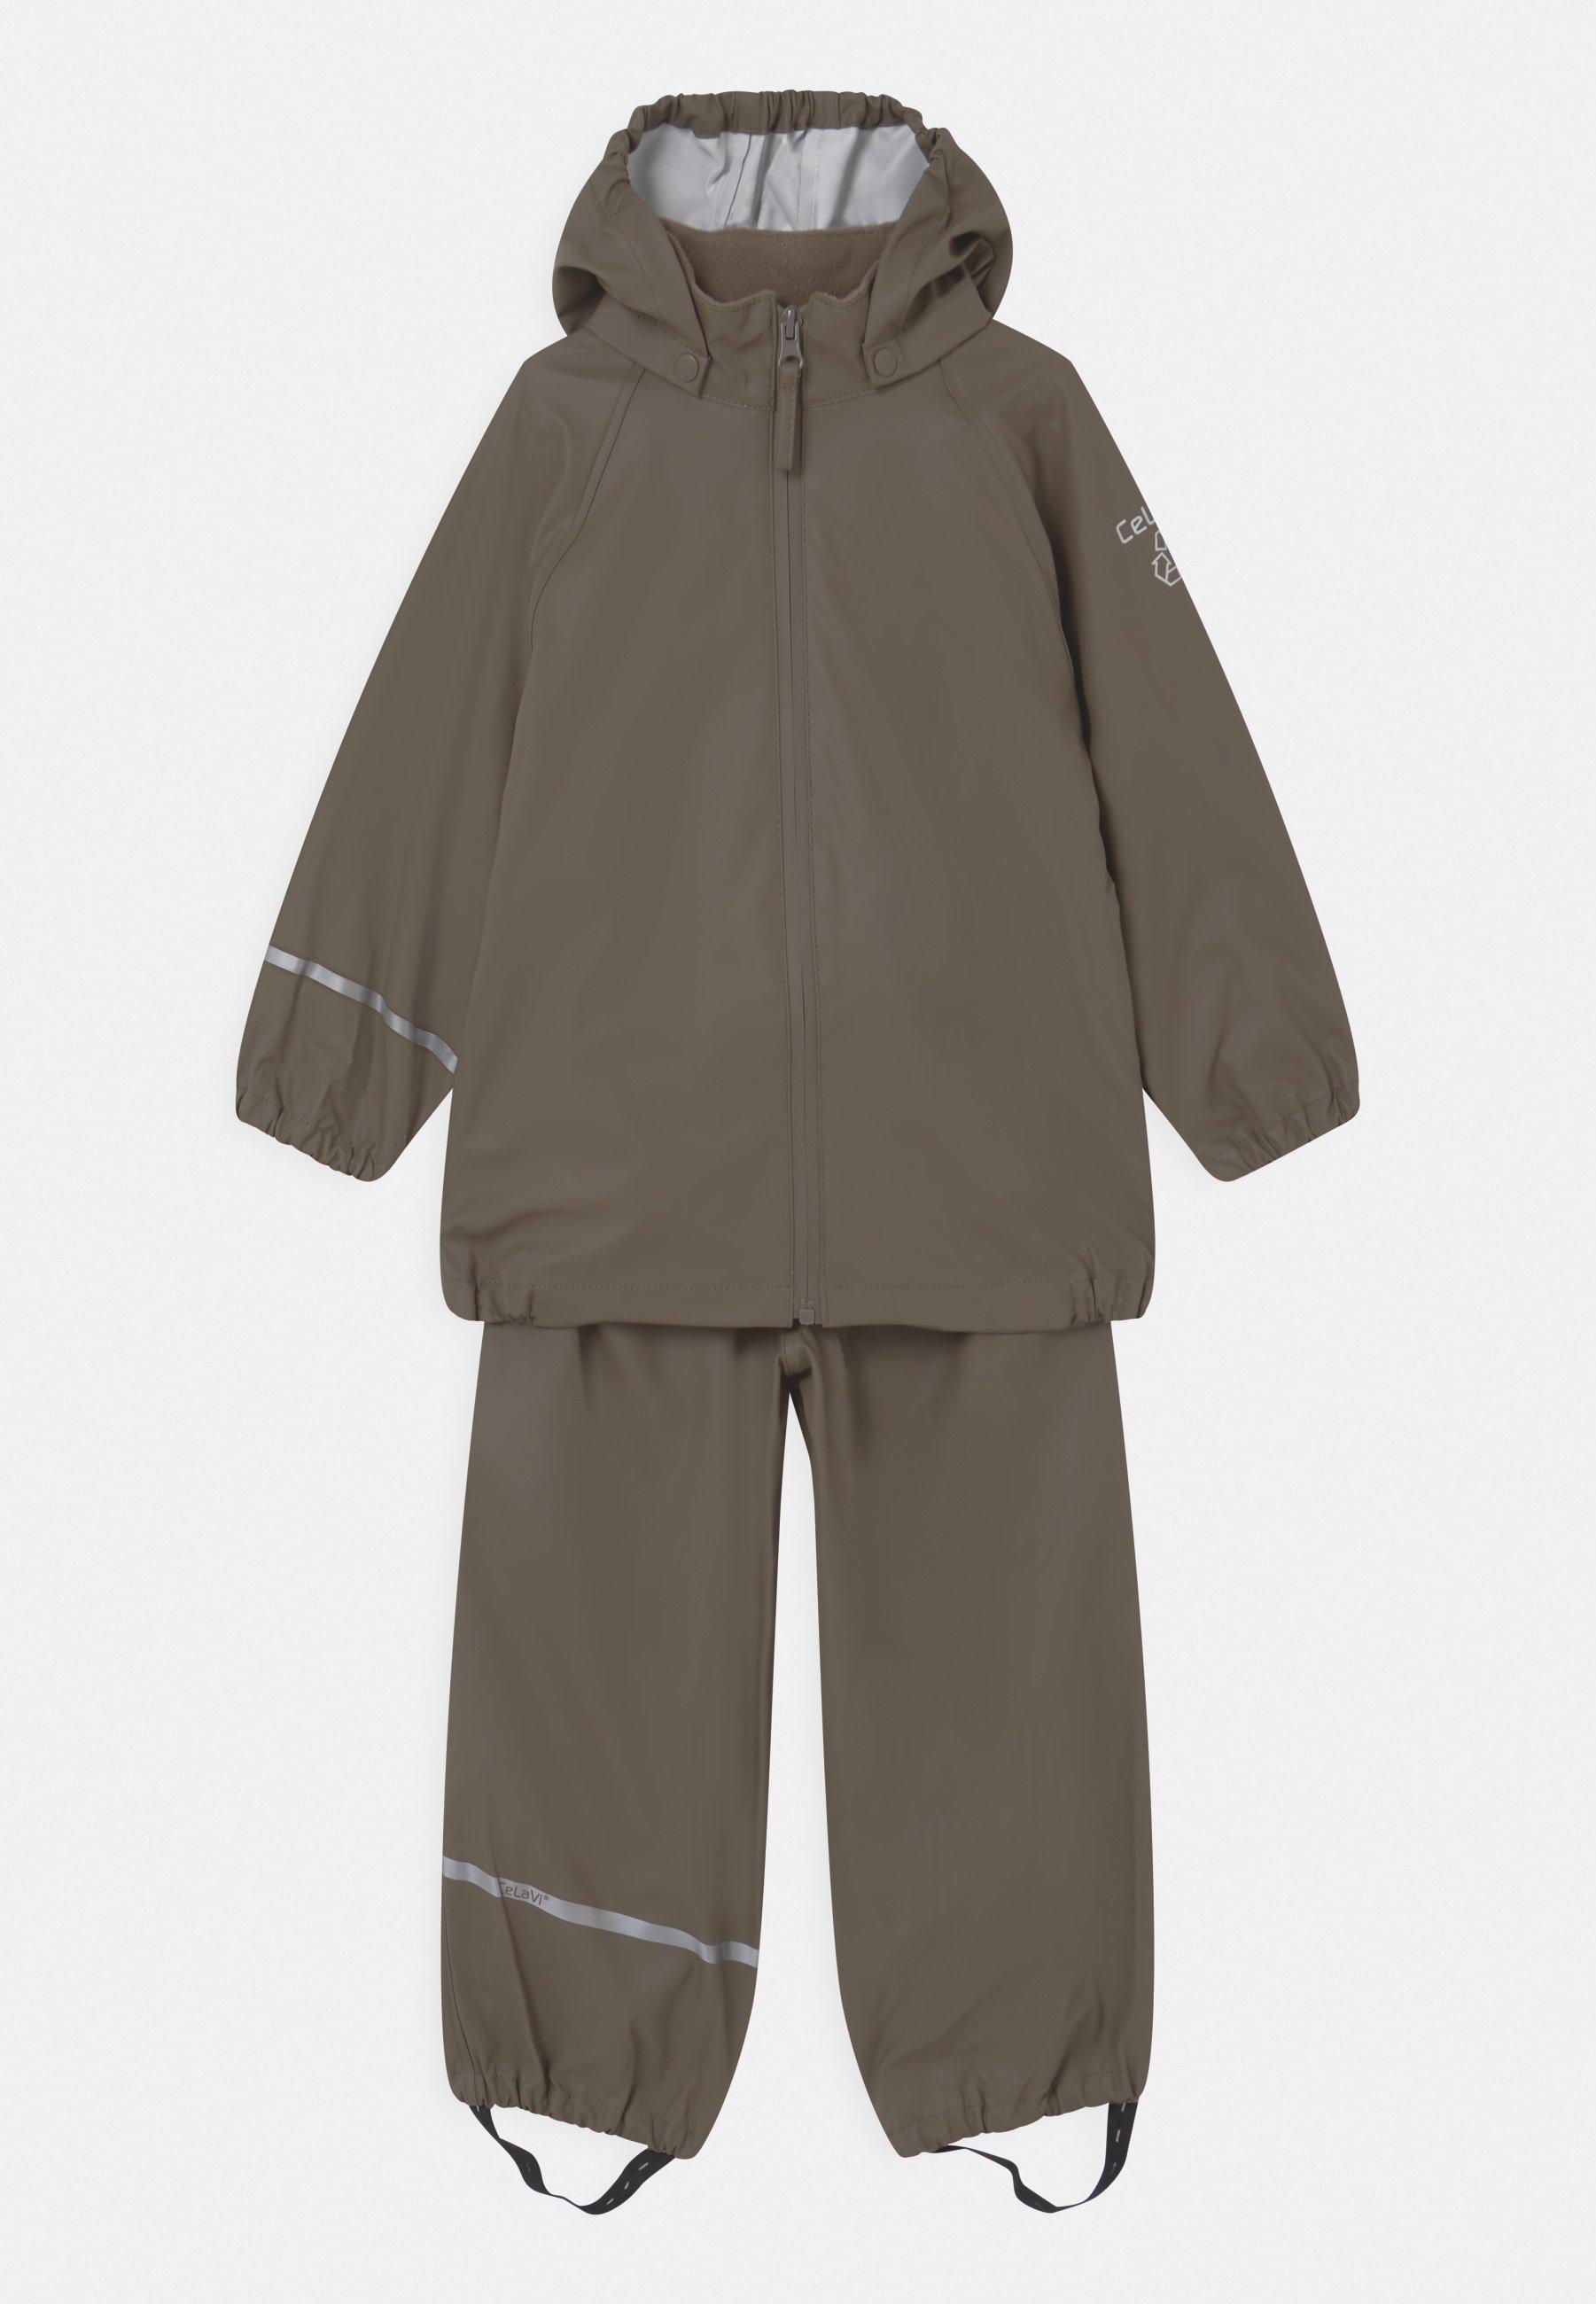 Kids BASIC RAINWEAR SET UNISEX - Rain trousers